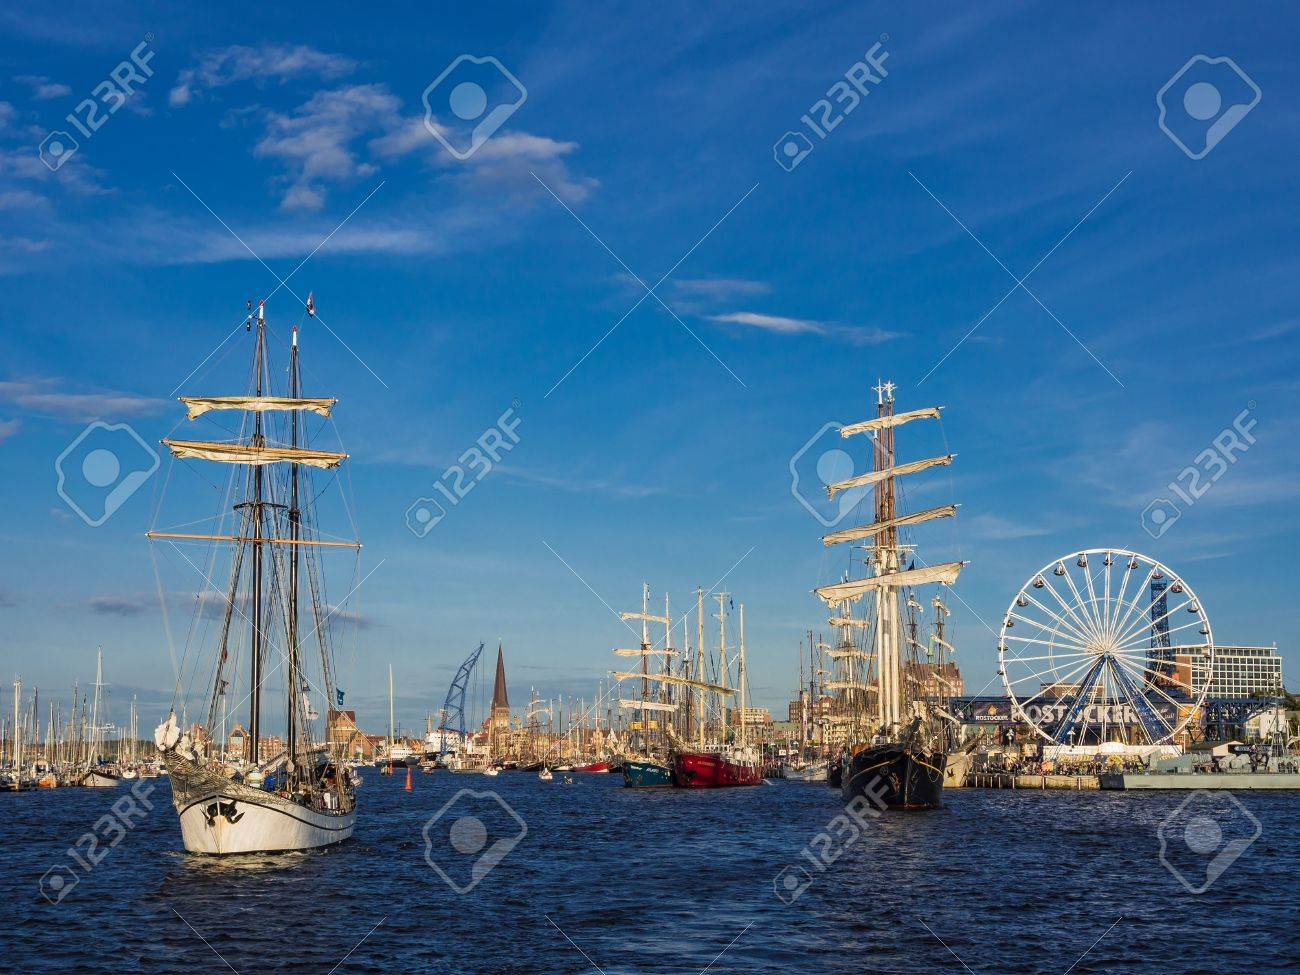 Hanseatic Sail 2012  in Rostock (Germany). Stock Photo - 14817838